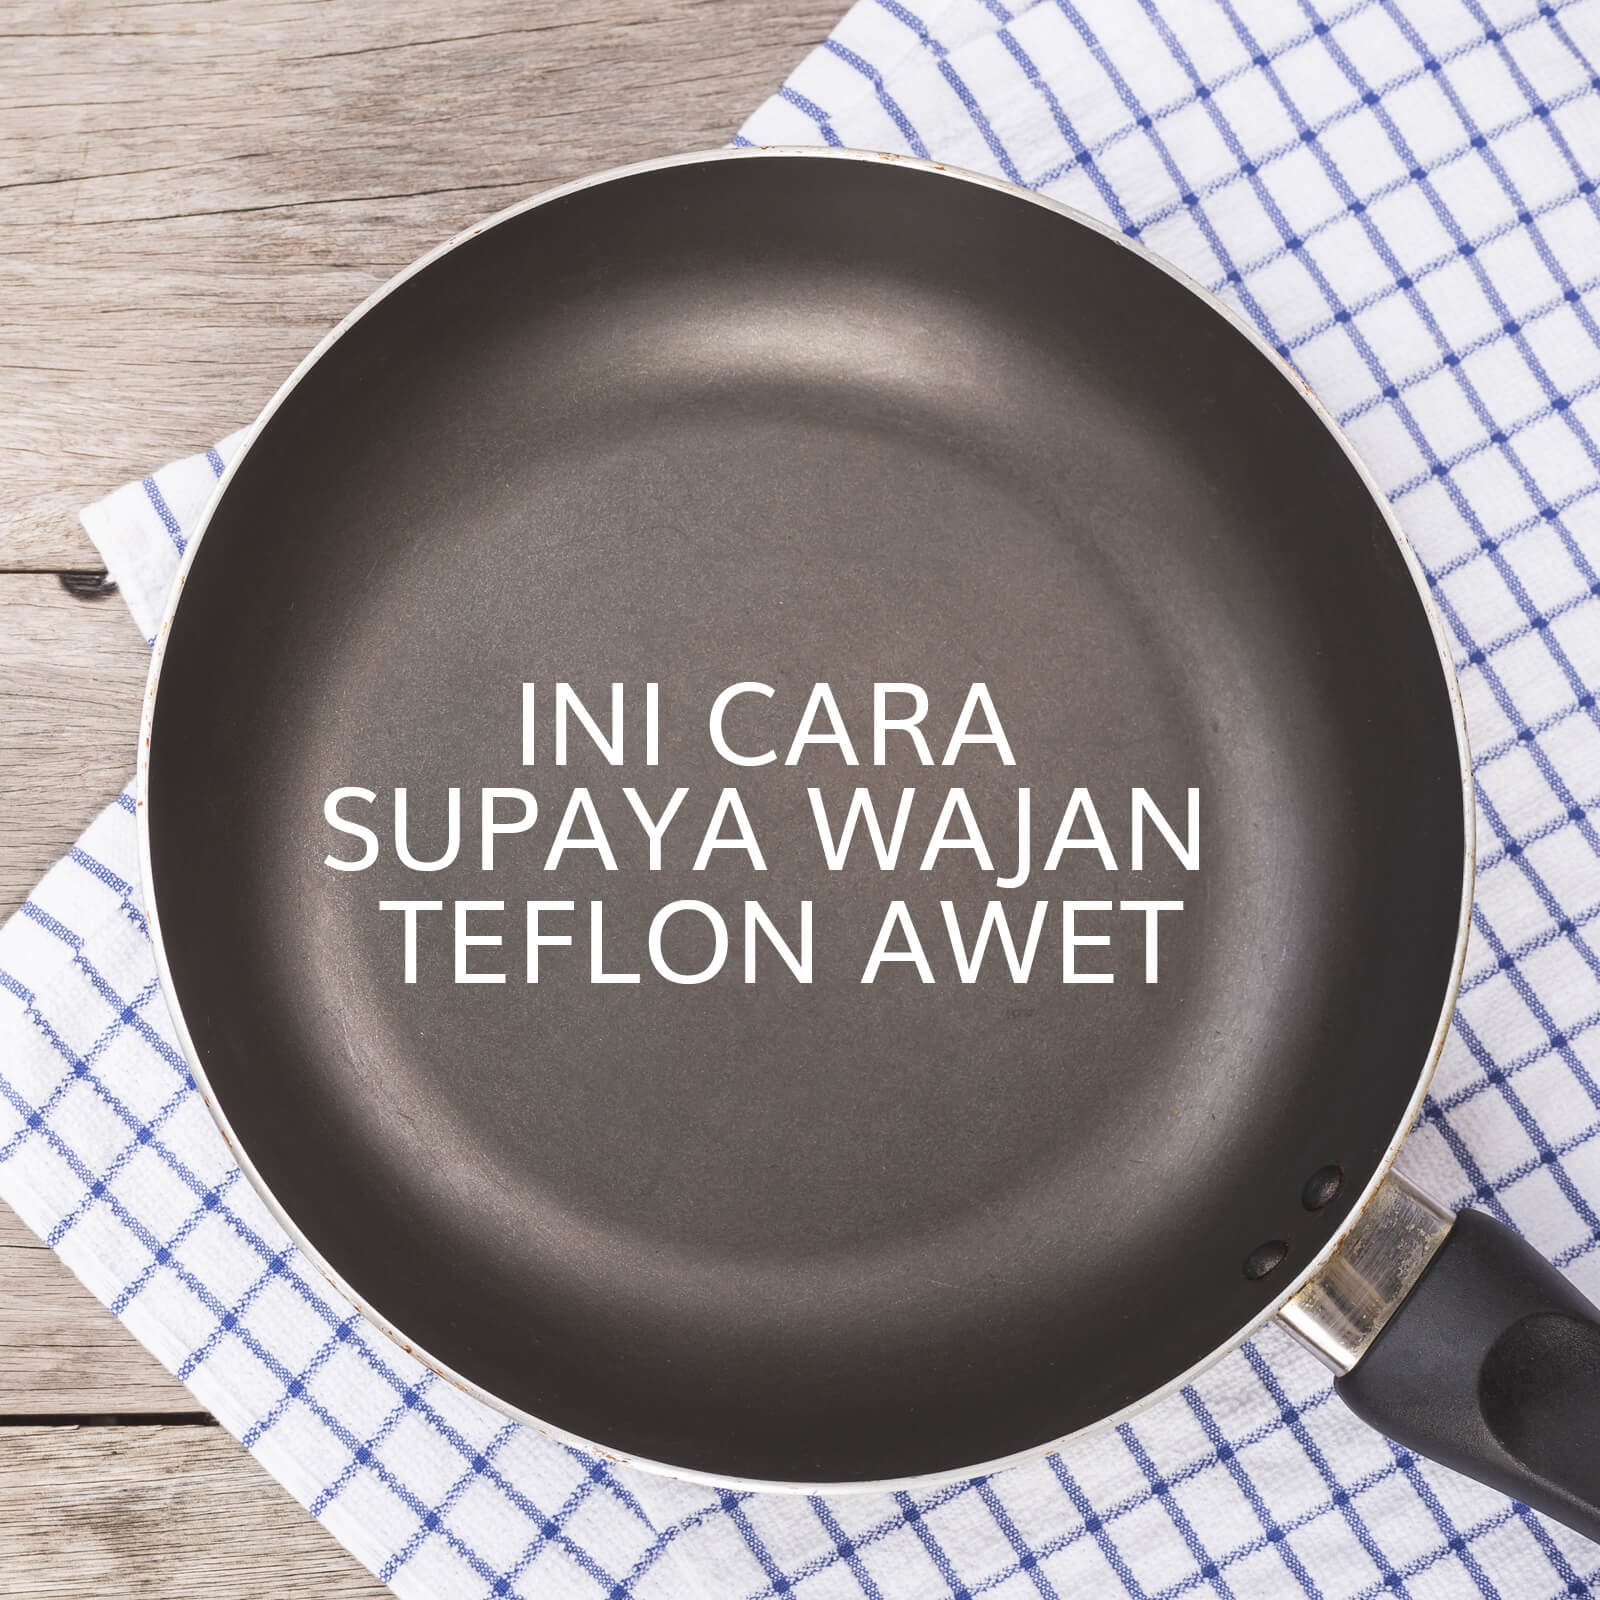 Image INI CARA SUPAYA WAJAN TEFLON AWET